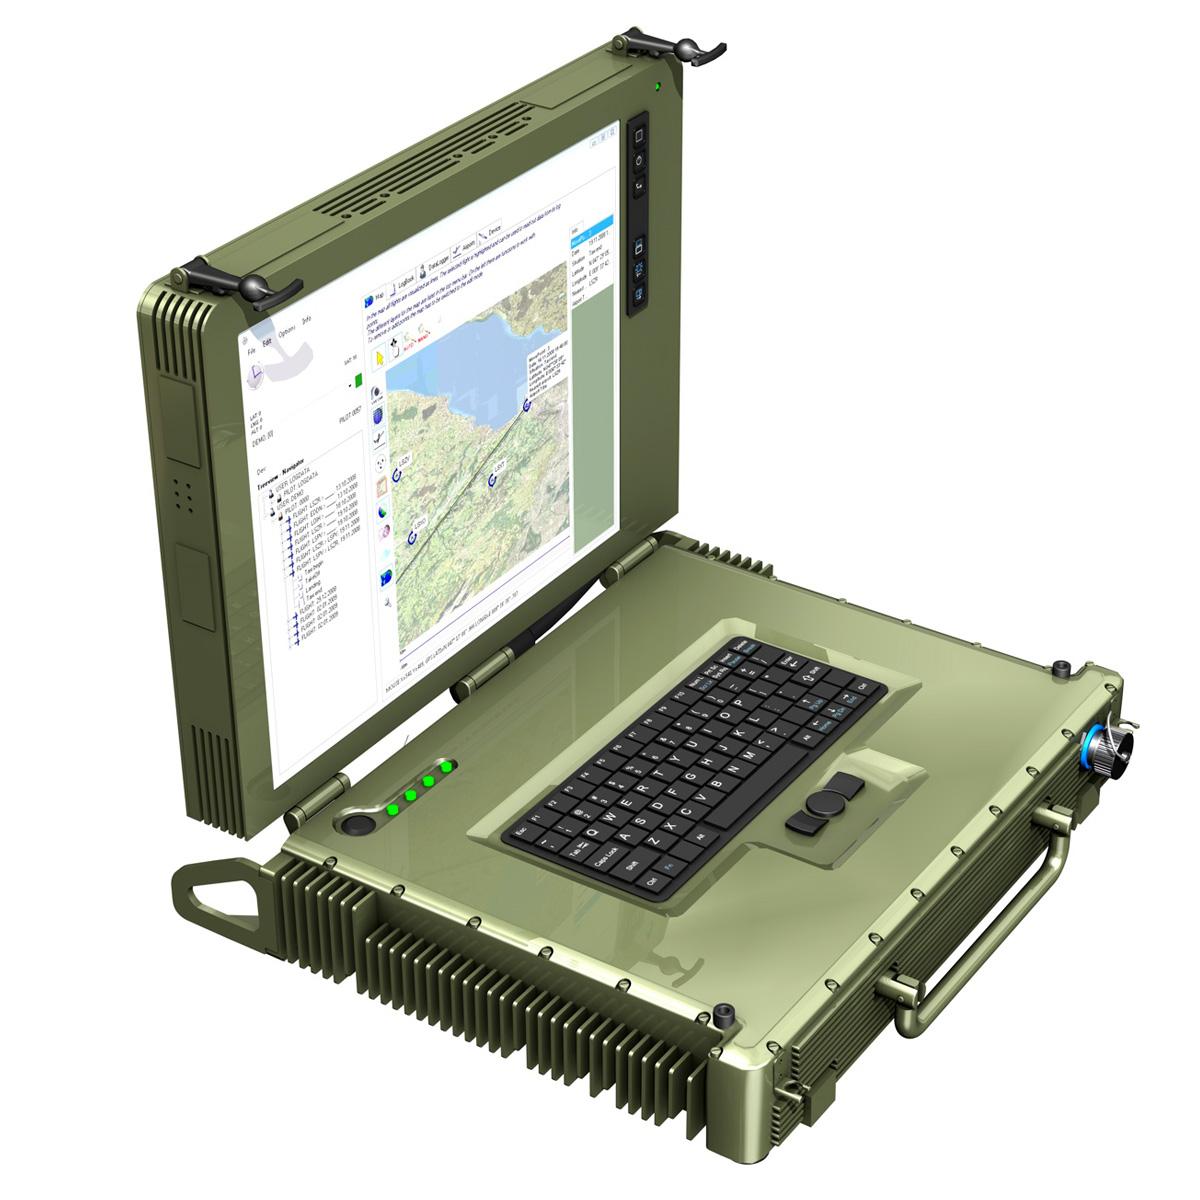 rugged military outdoor laptop 3d model 3ds fbx c4d lwo obj 189356